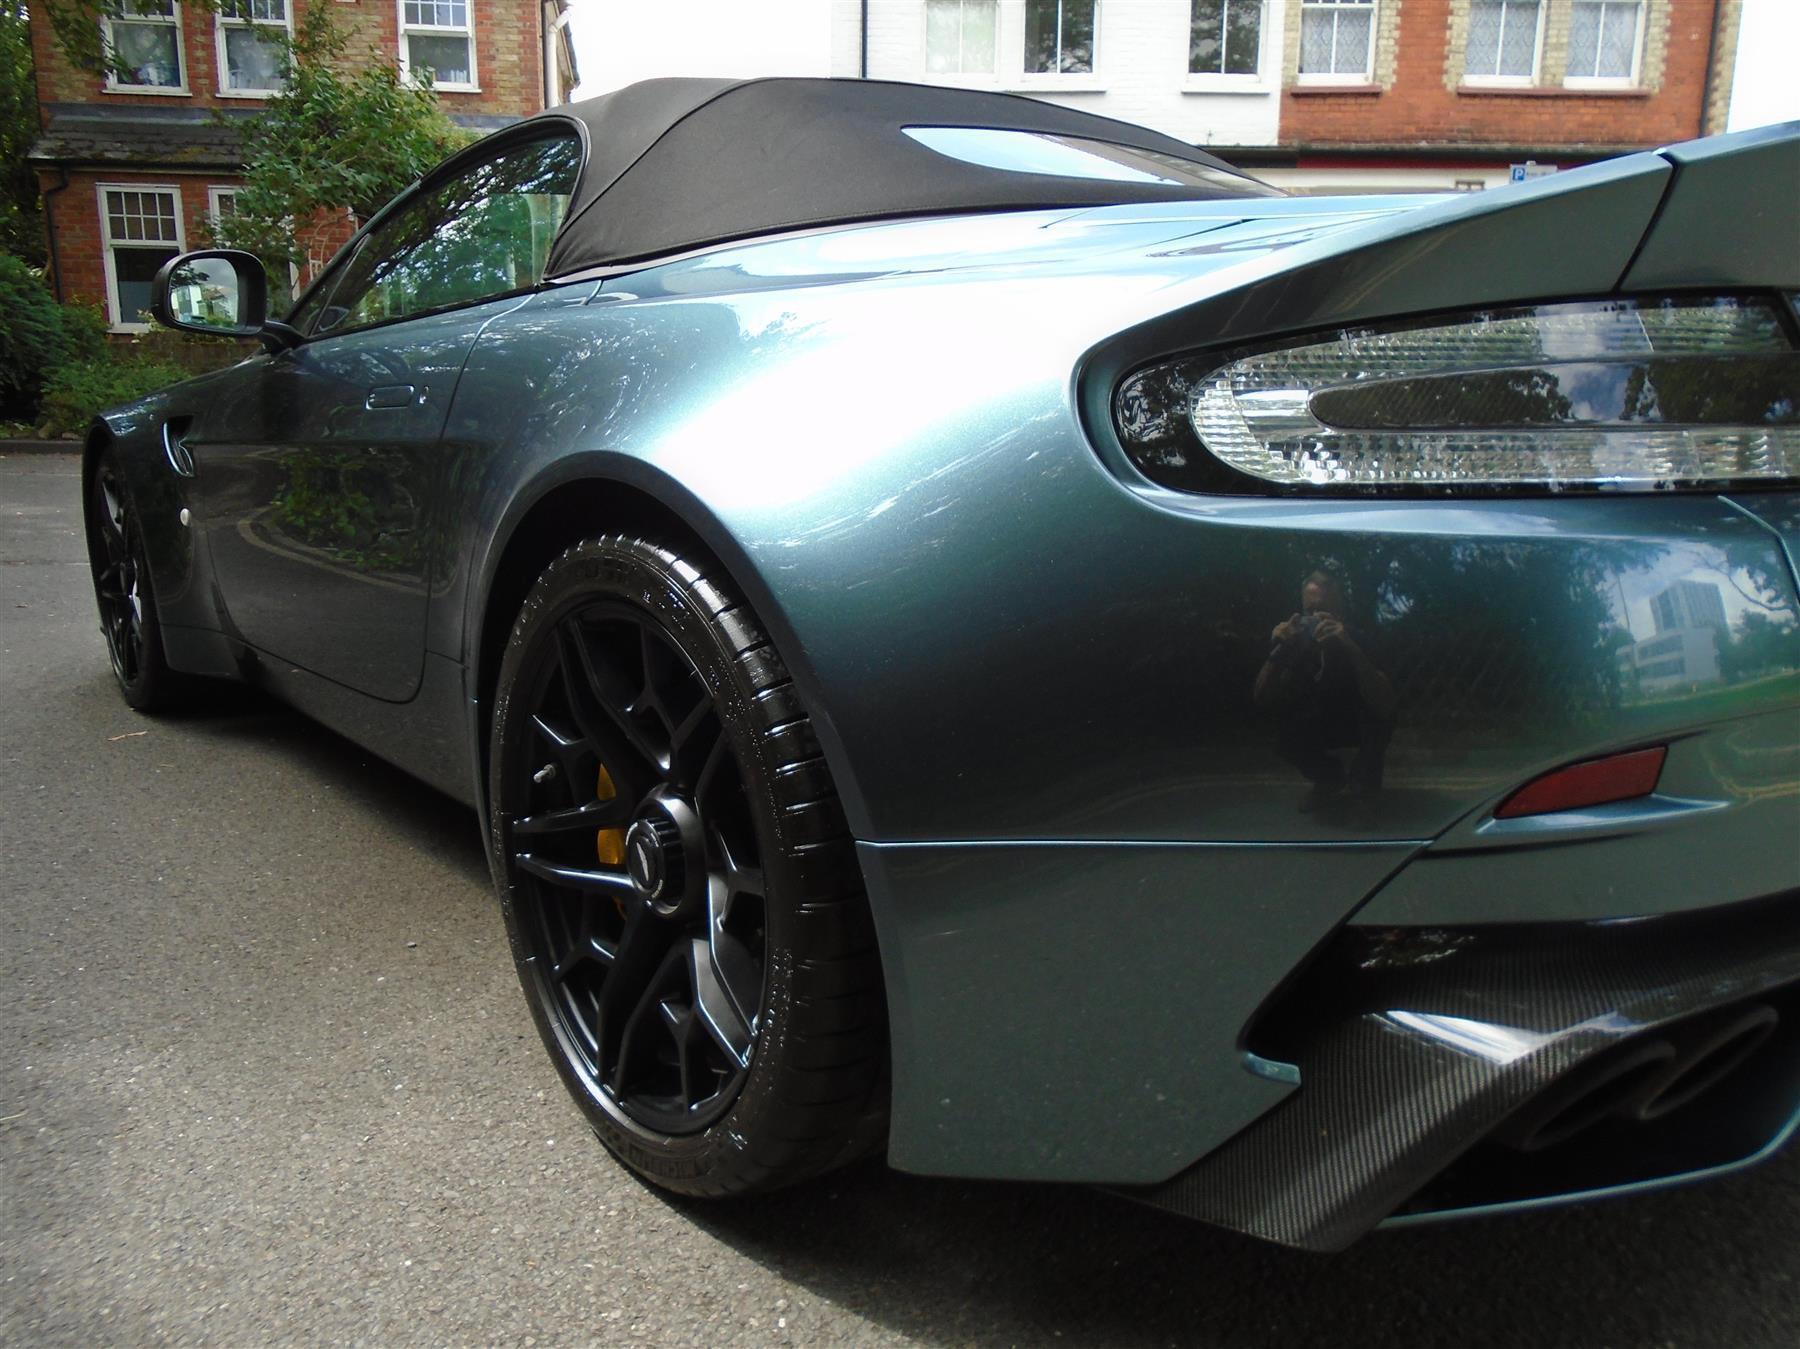 Aston_Martin_V12_Vantage_V600_Roadster_sale-0010